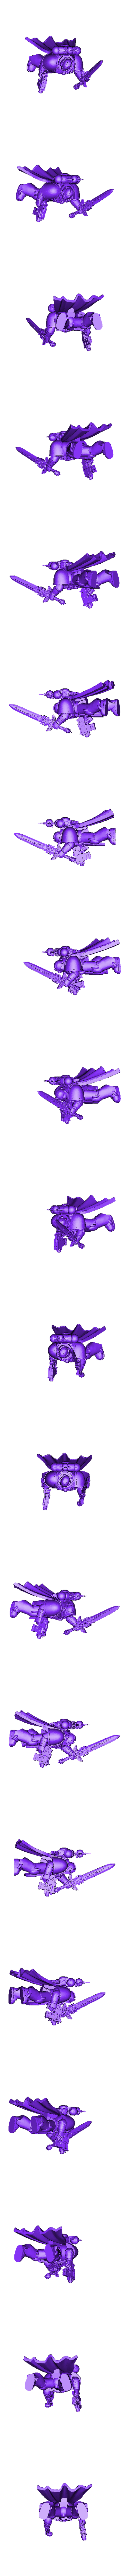 mildcat_capn.stl Download free STL file Inspirational General now with cloak and tassels • 3D printing design, KarnageKing